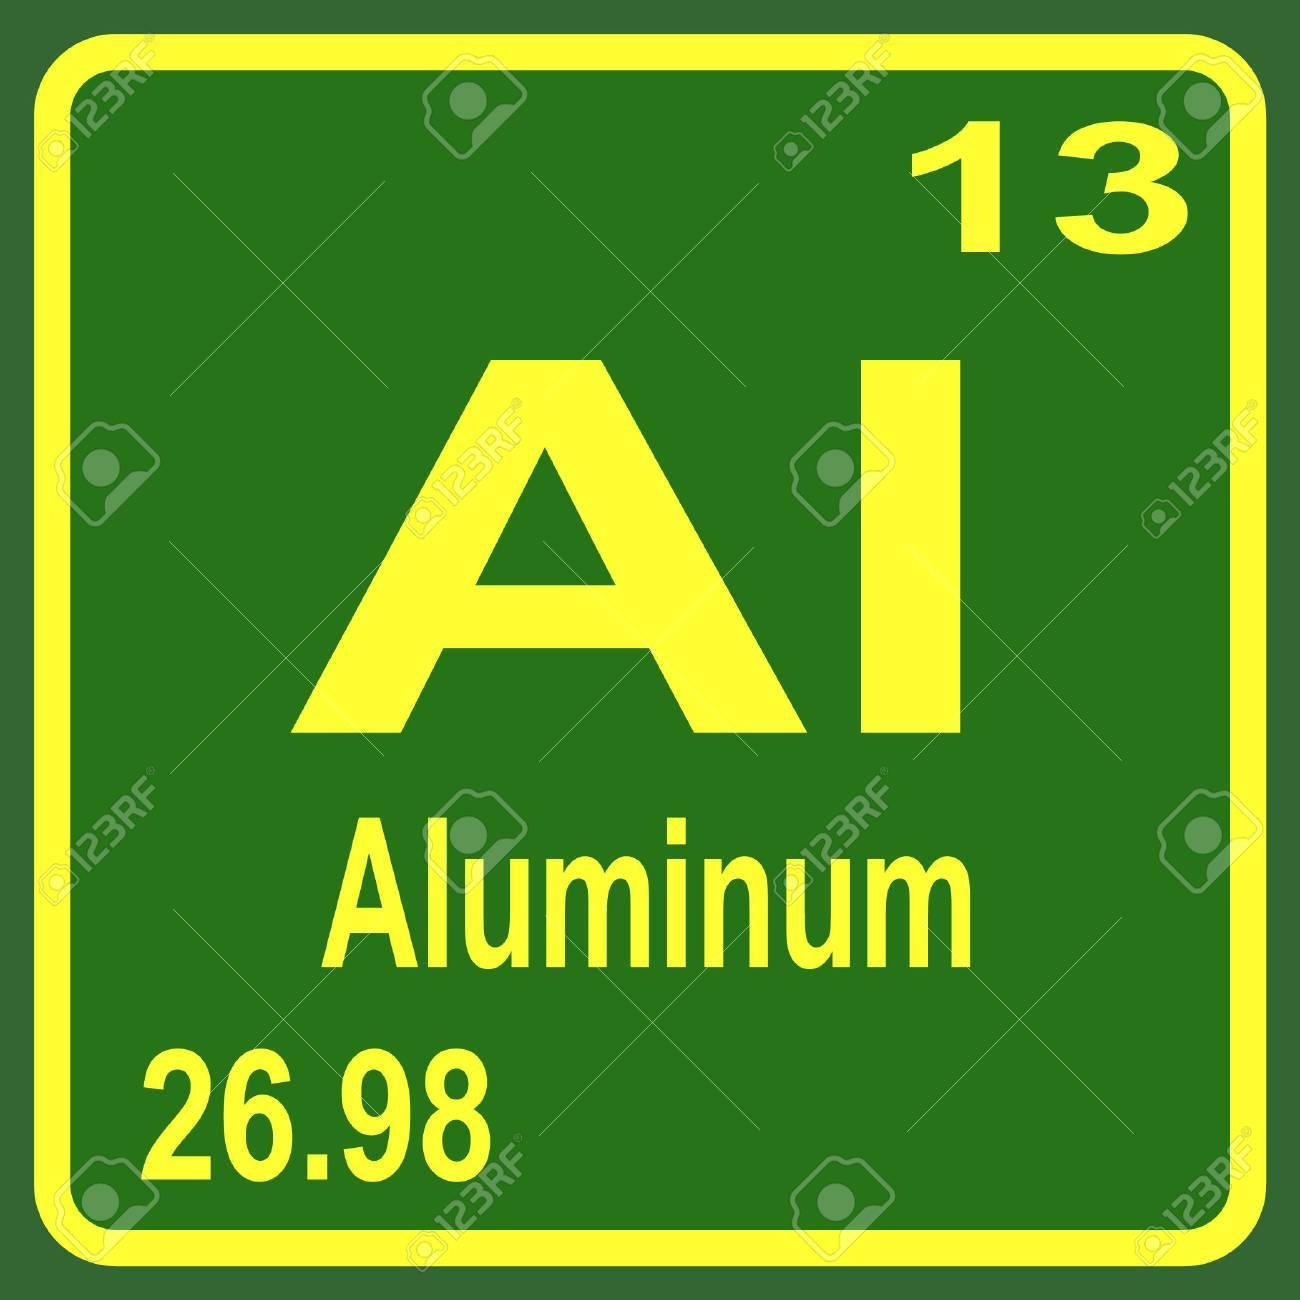 Periodic table of elements aluminum royalty free cliparts vectors periodic table of elements aluminum stock vector 53901619 urtaz Choice Image